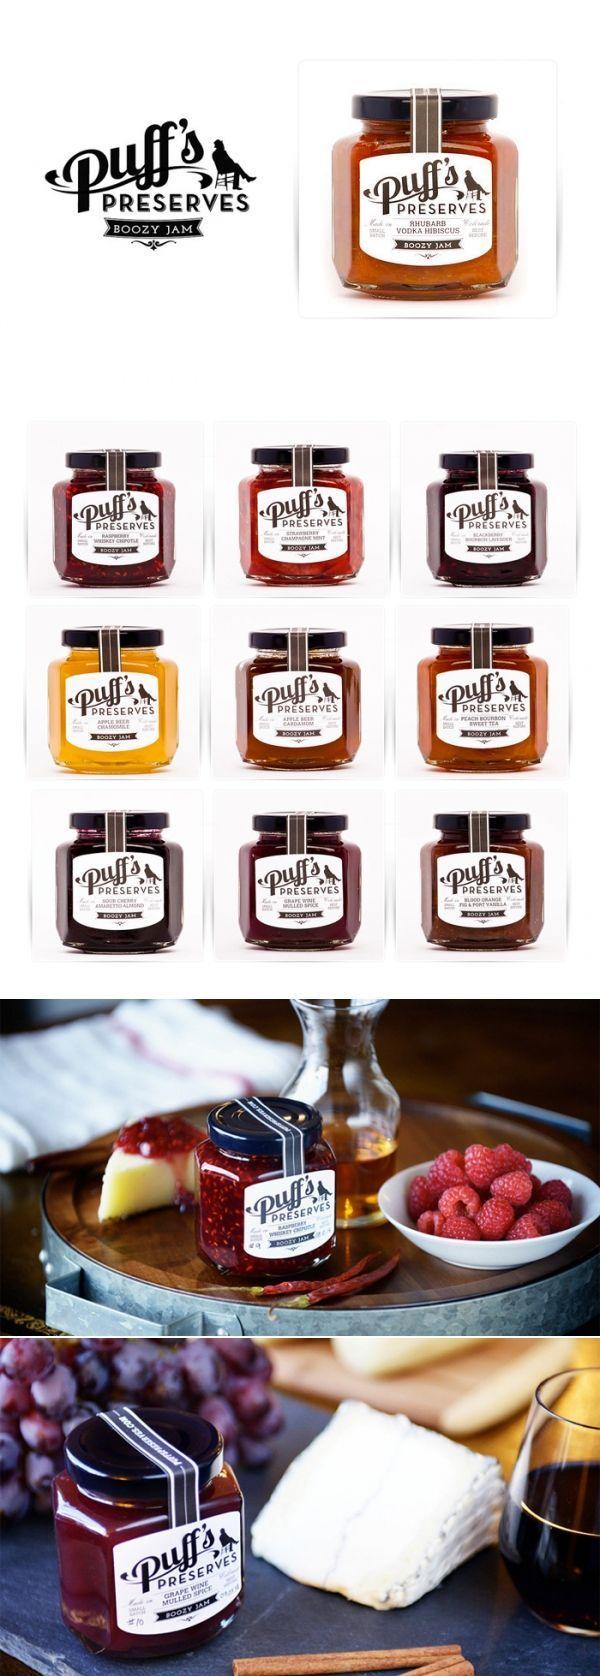 Label / Puff's Preserves Boozy Jam